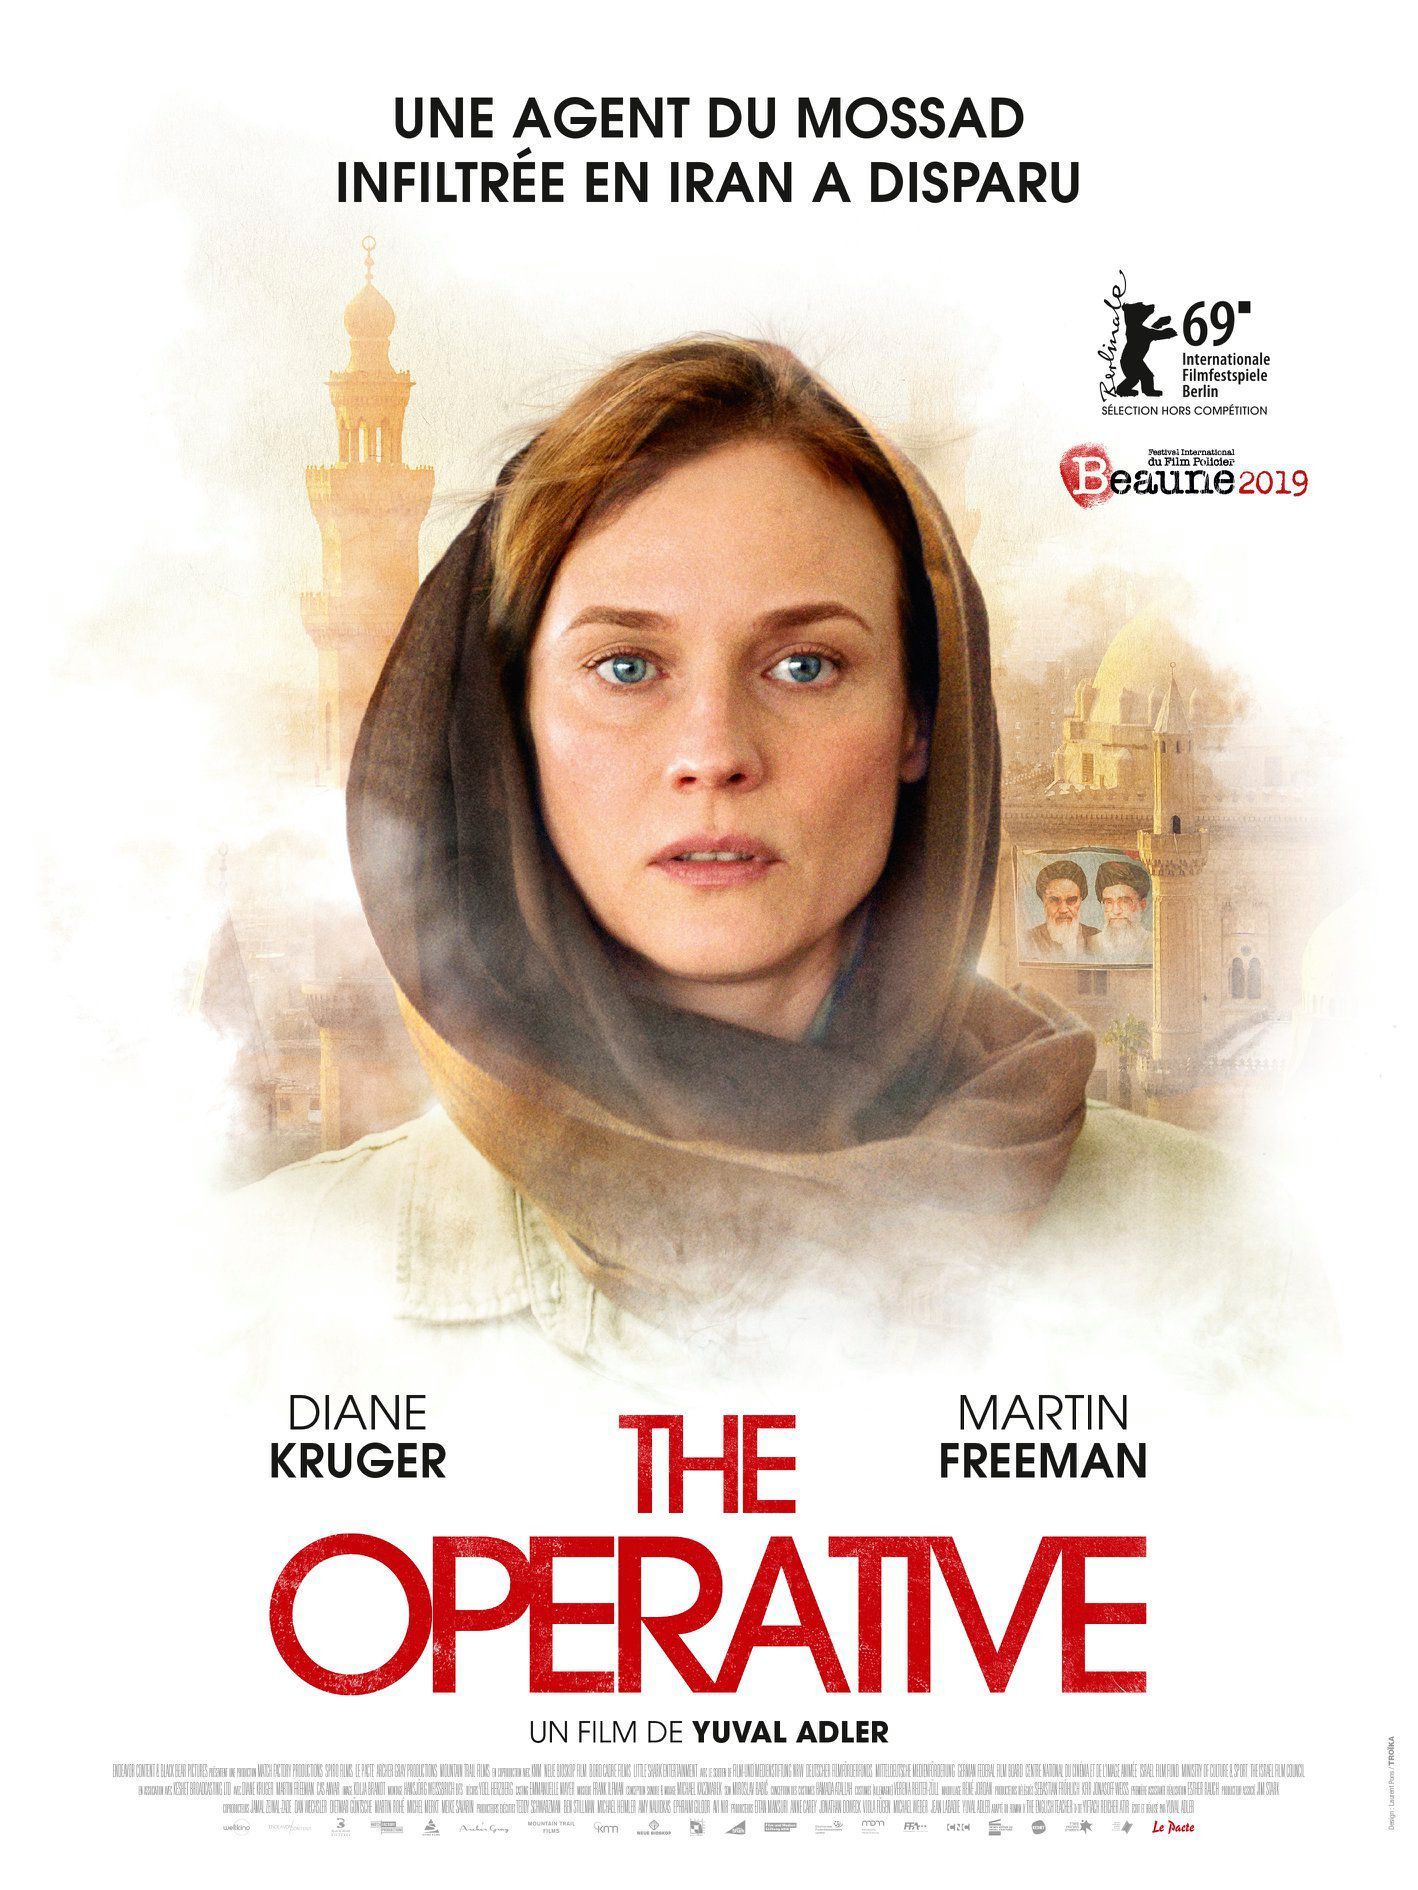 The Operative - Film (2019)